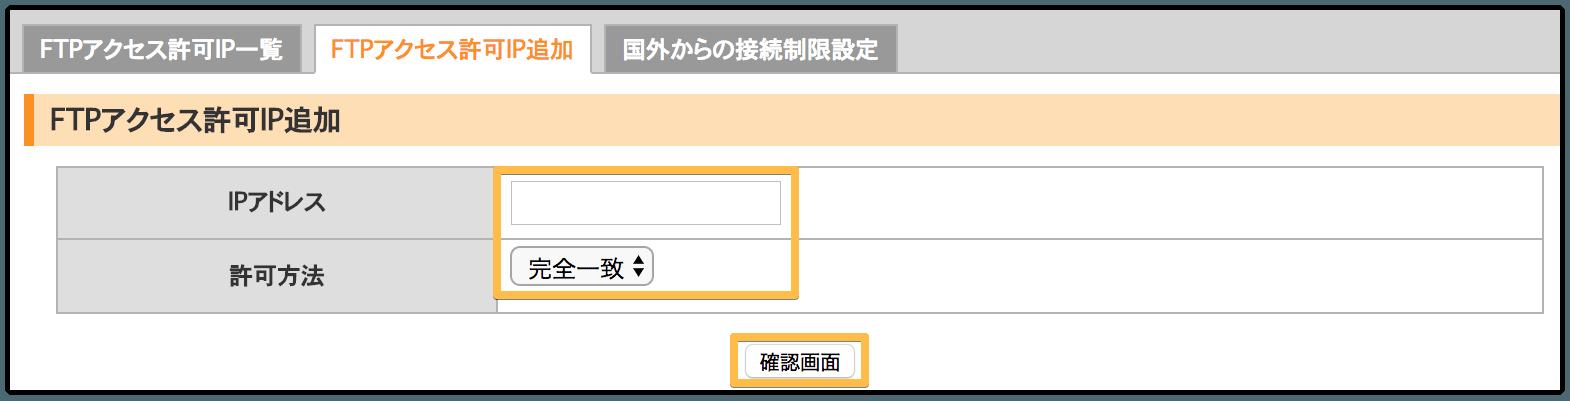 FTPアクセス許可IP追加2